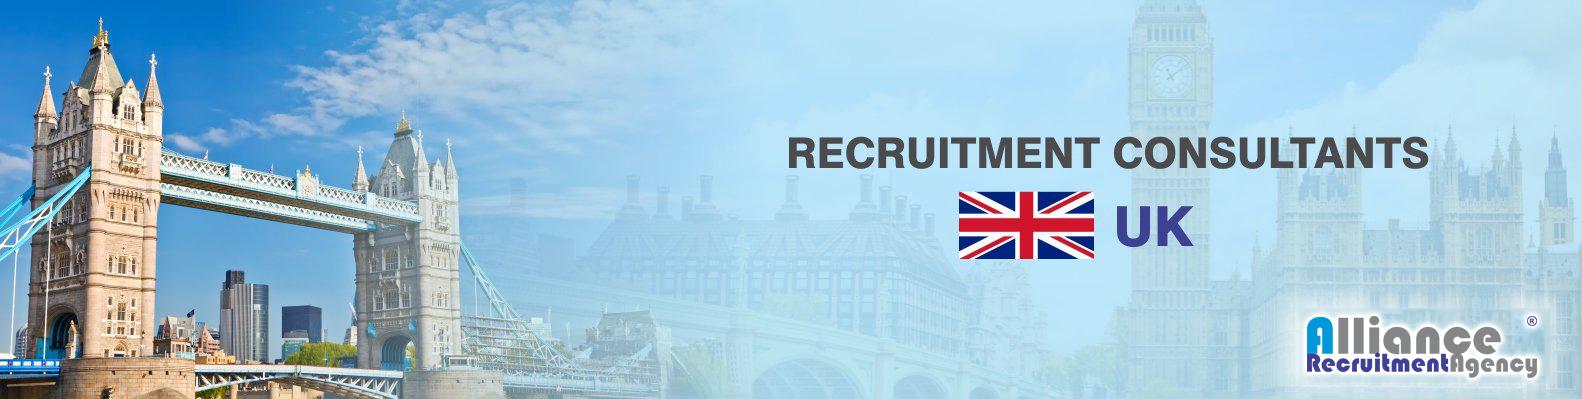 recruitment agency uk